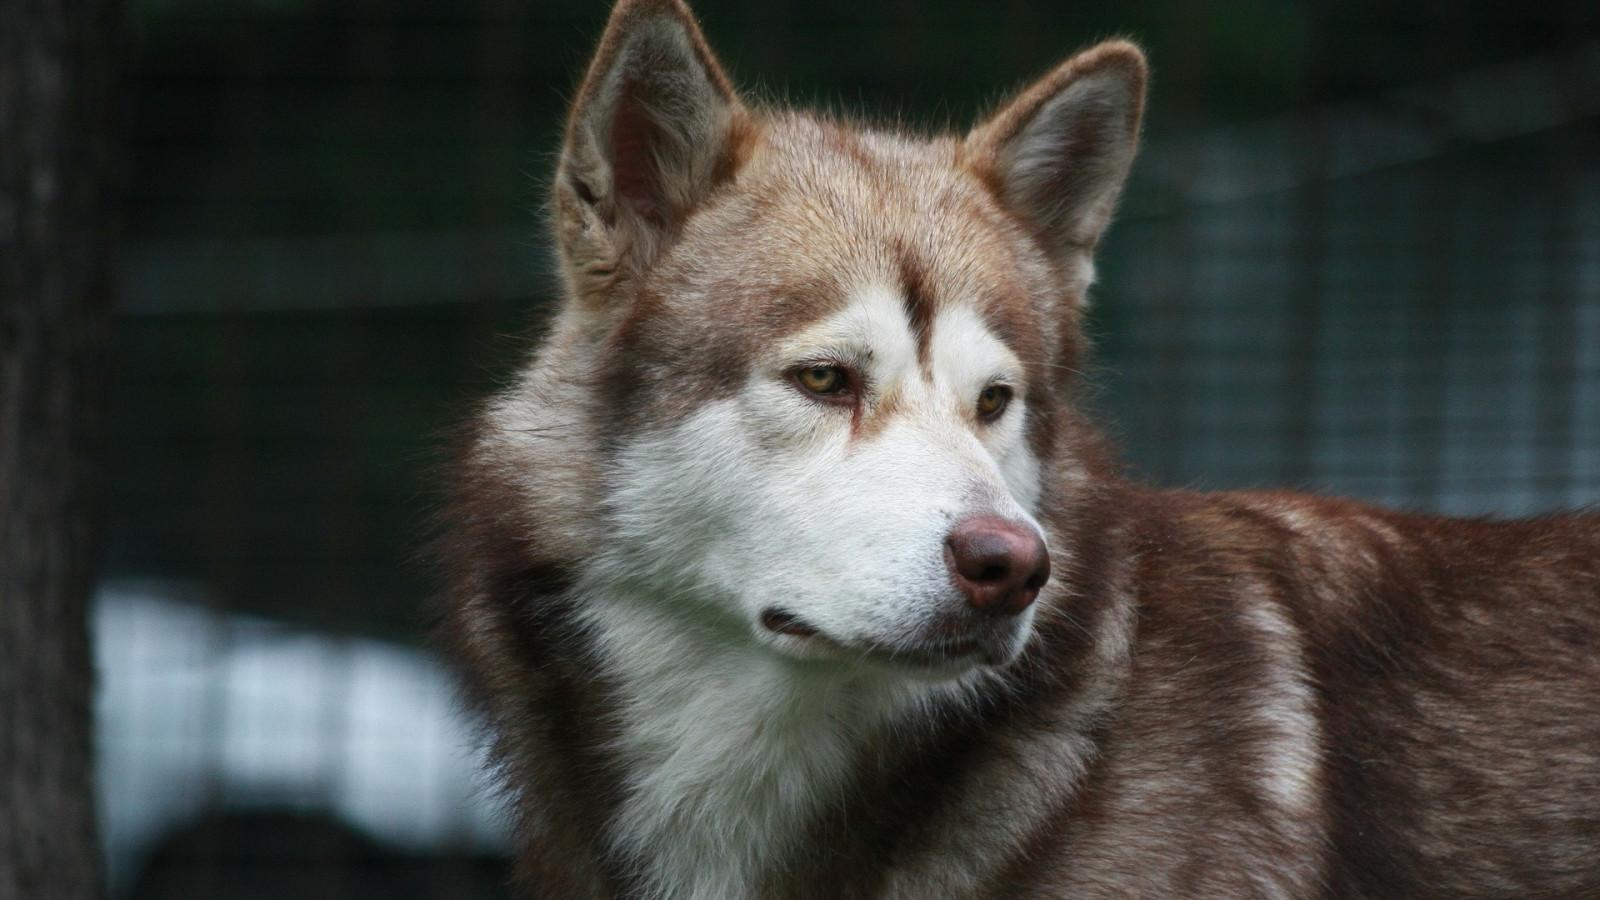 1080 Huky Puppies: Wallpaper : Wolf, Siberian Husky, 1920x1080 Px, Vertebrate